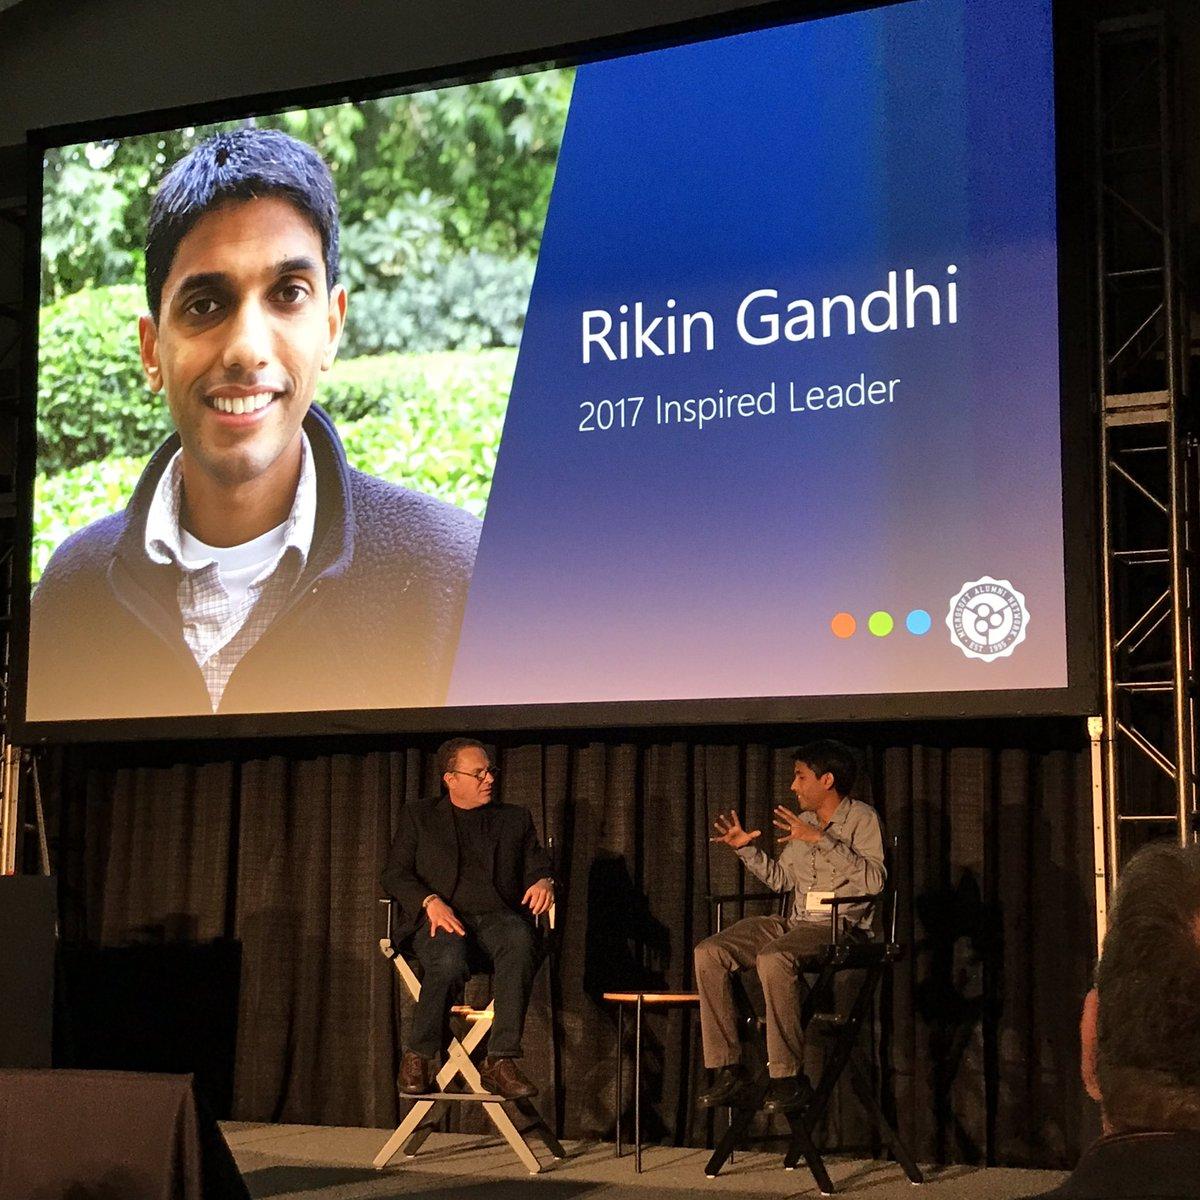 Finally @rikingandhi  ... Microsoft Alumni Network - Official 2017 Inspired Leader   #MSFTalum with @RichardJKaplan<br>http://pic.twitter.com/RBimMzLFDg